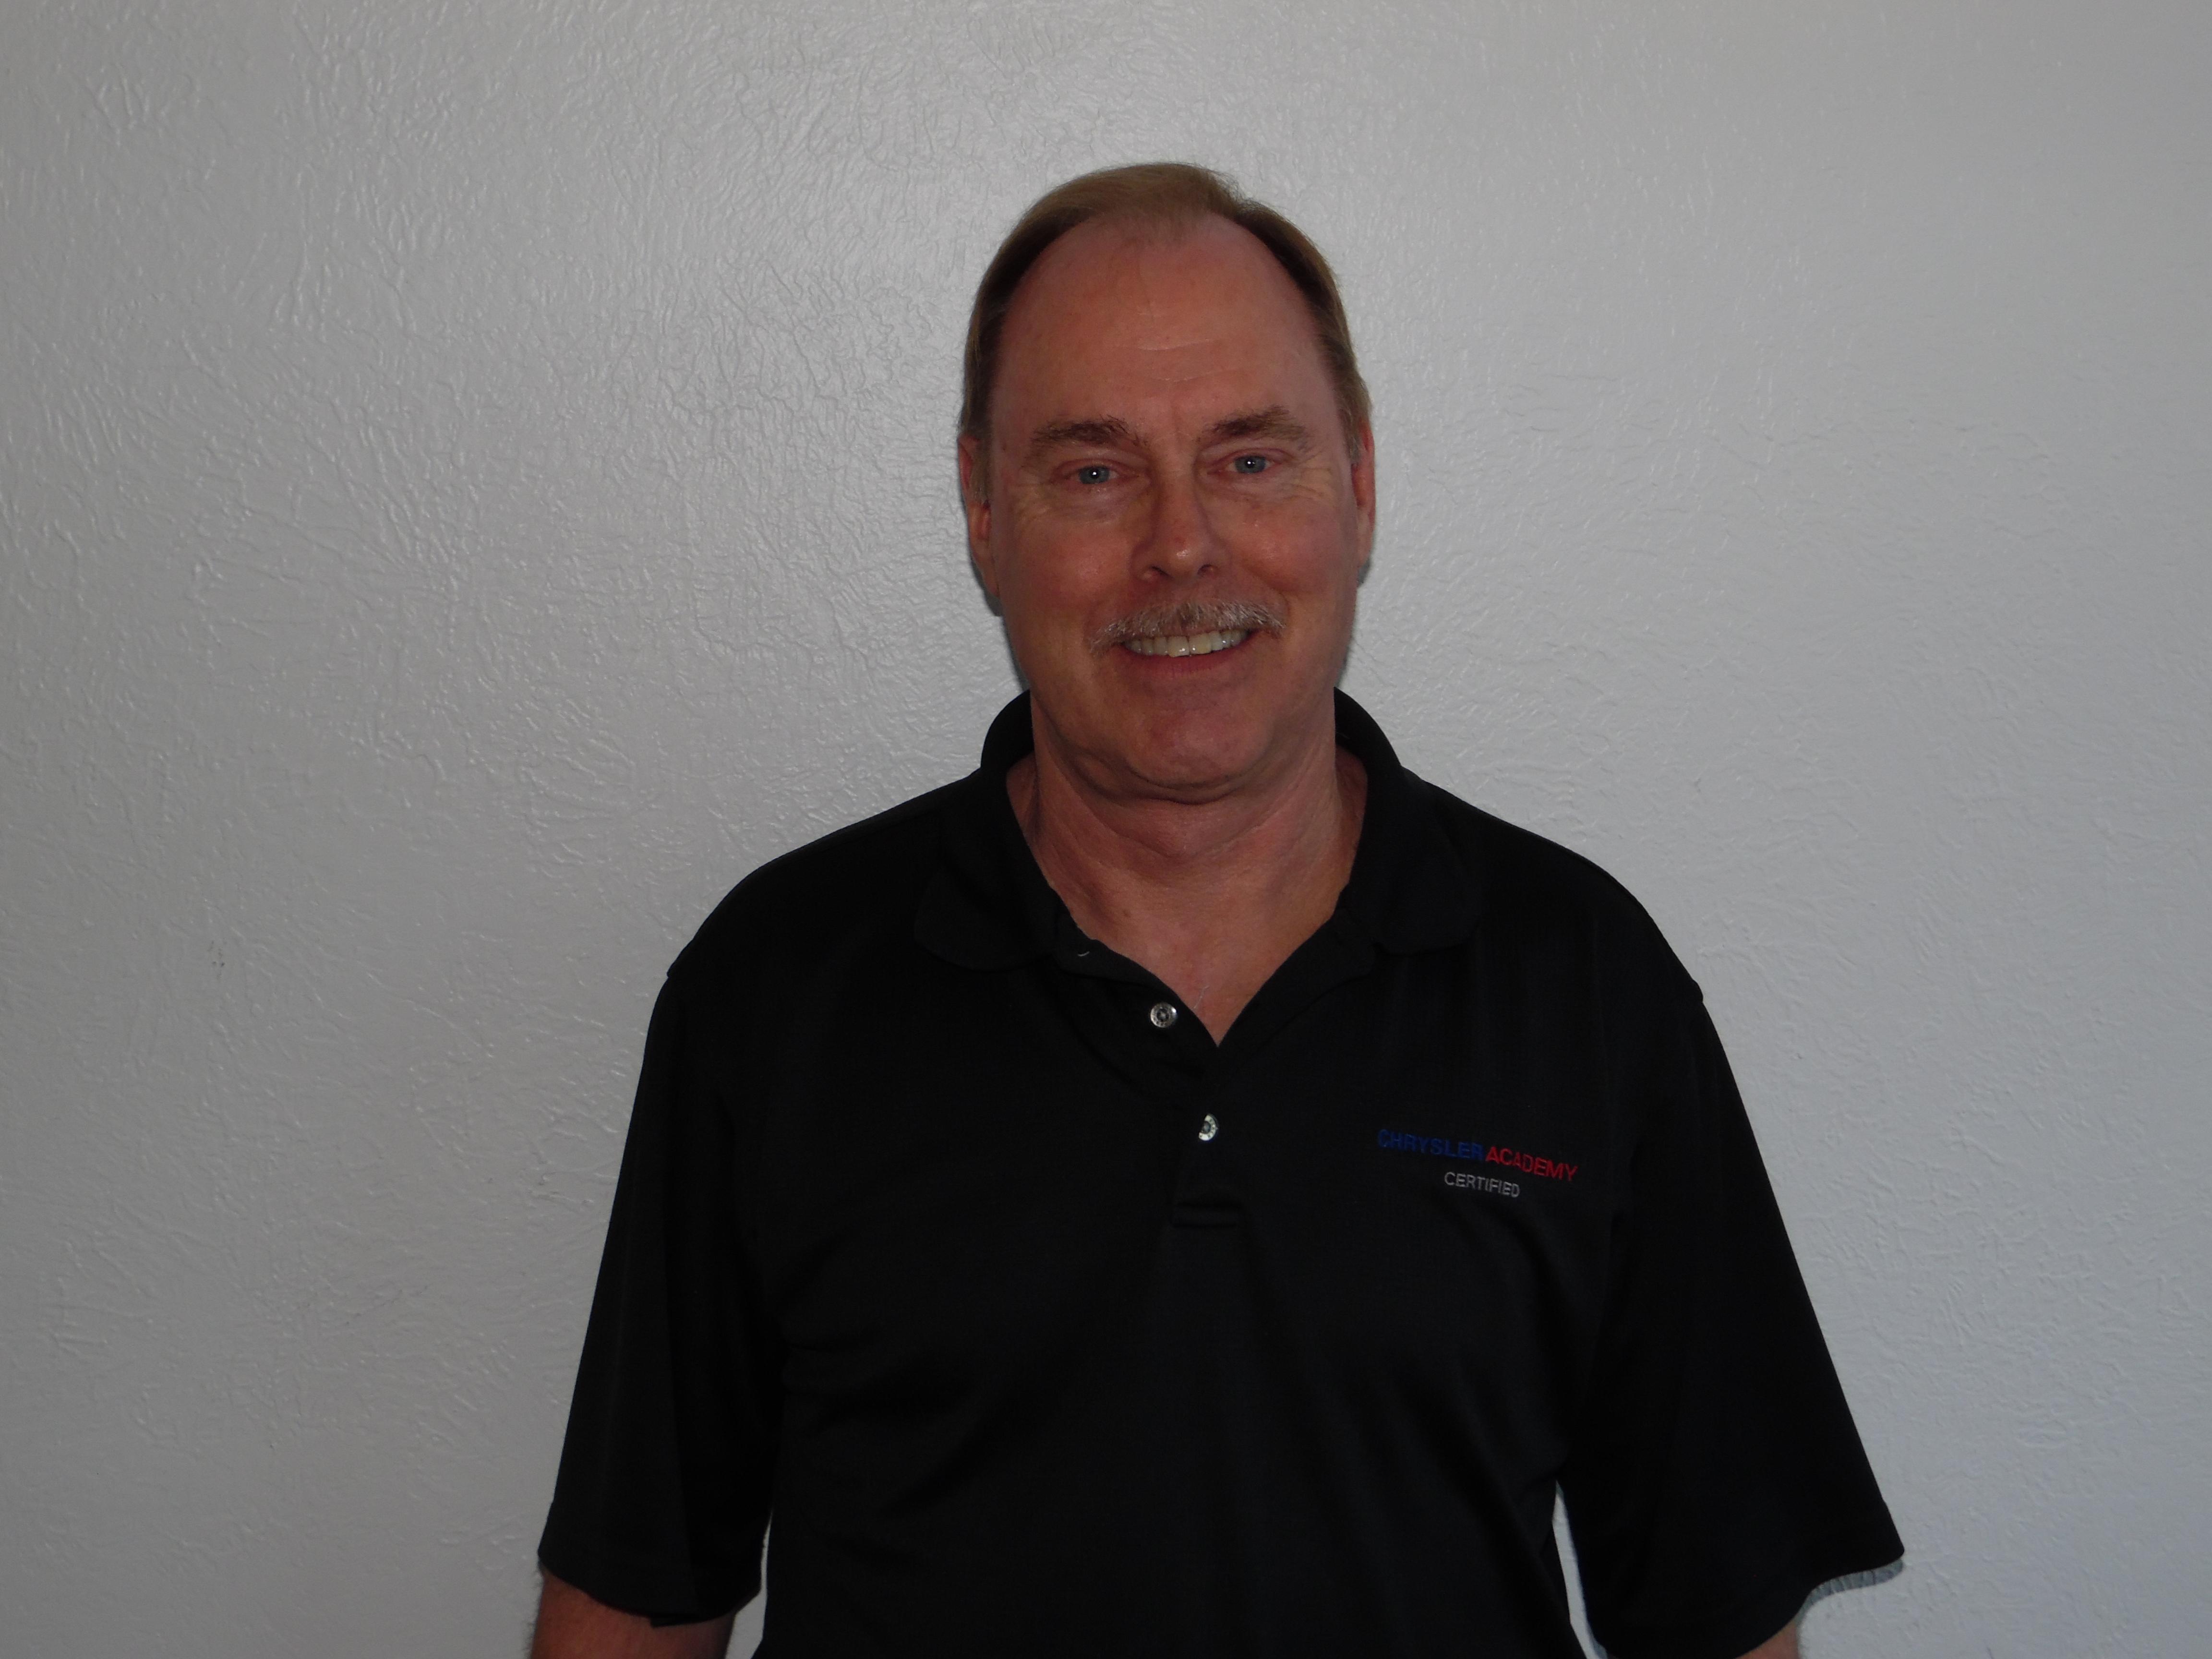 Bill Wegehoft